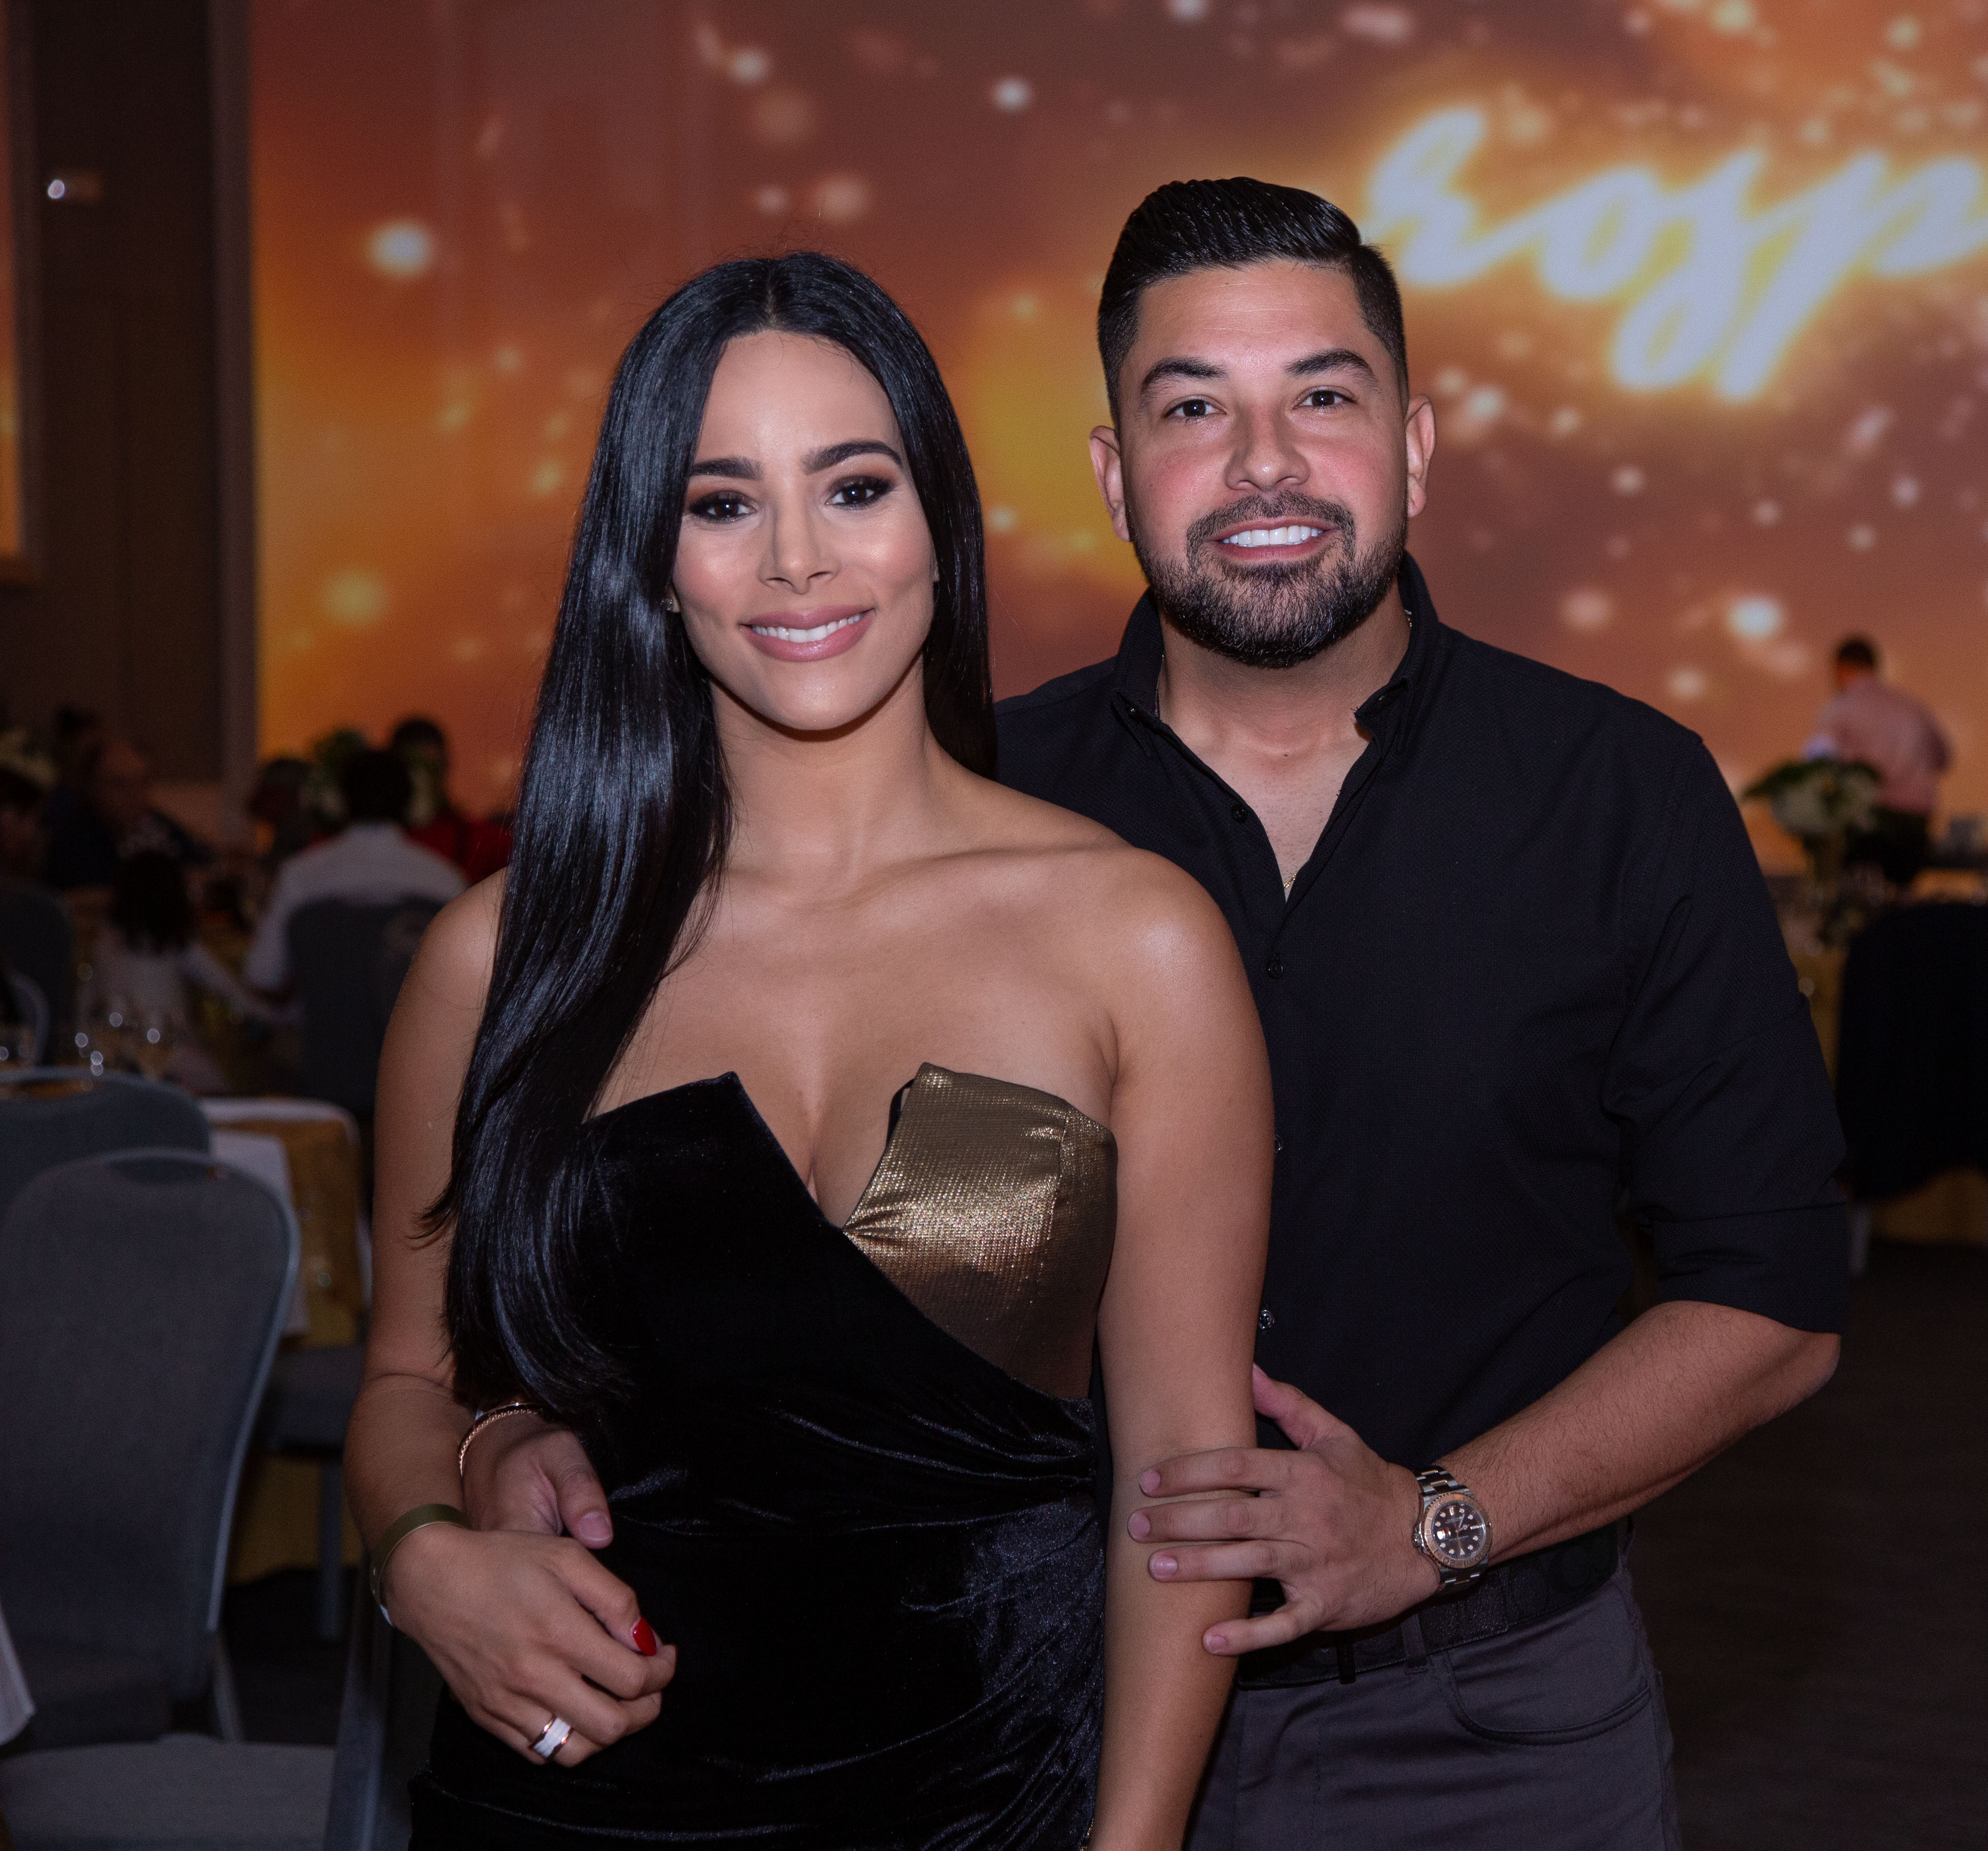 Juan Pablo Díaz y Melanie Maffuz. (Suministrada)